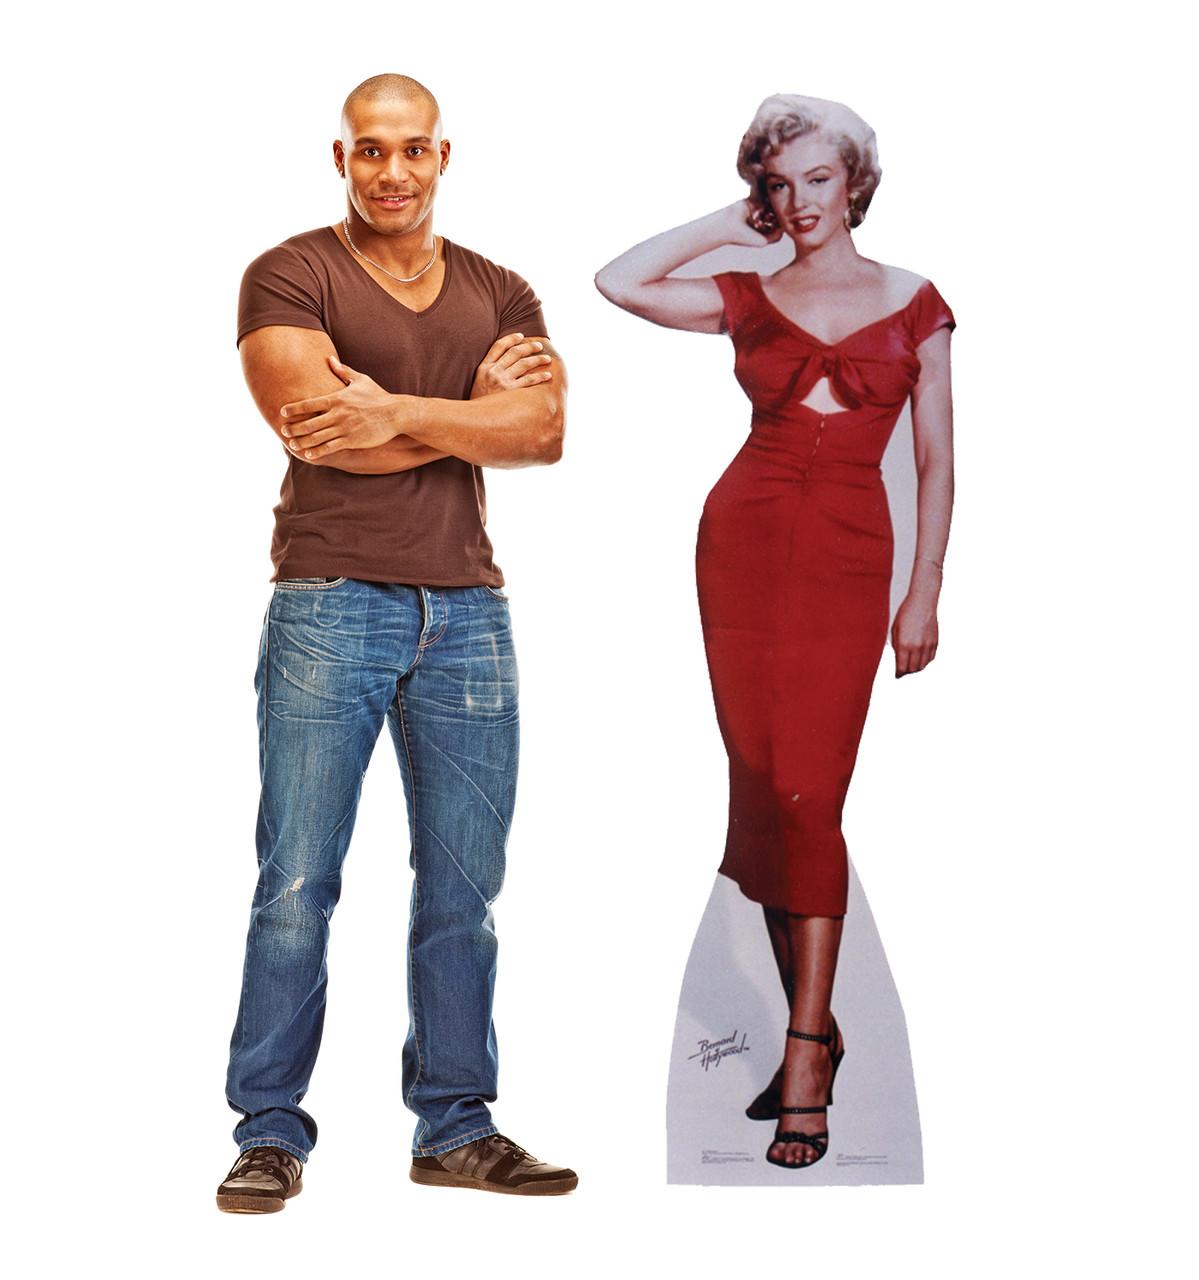 Life-size cardboard standee of Marilyn Monroe Niagara with model.